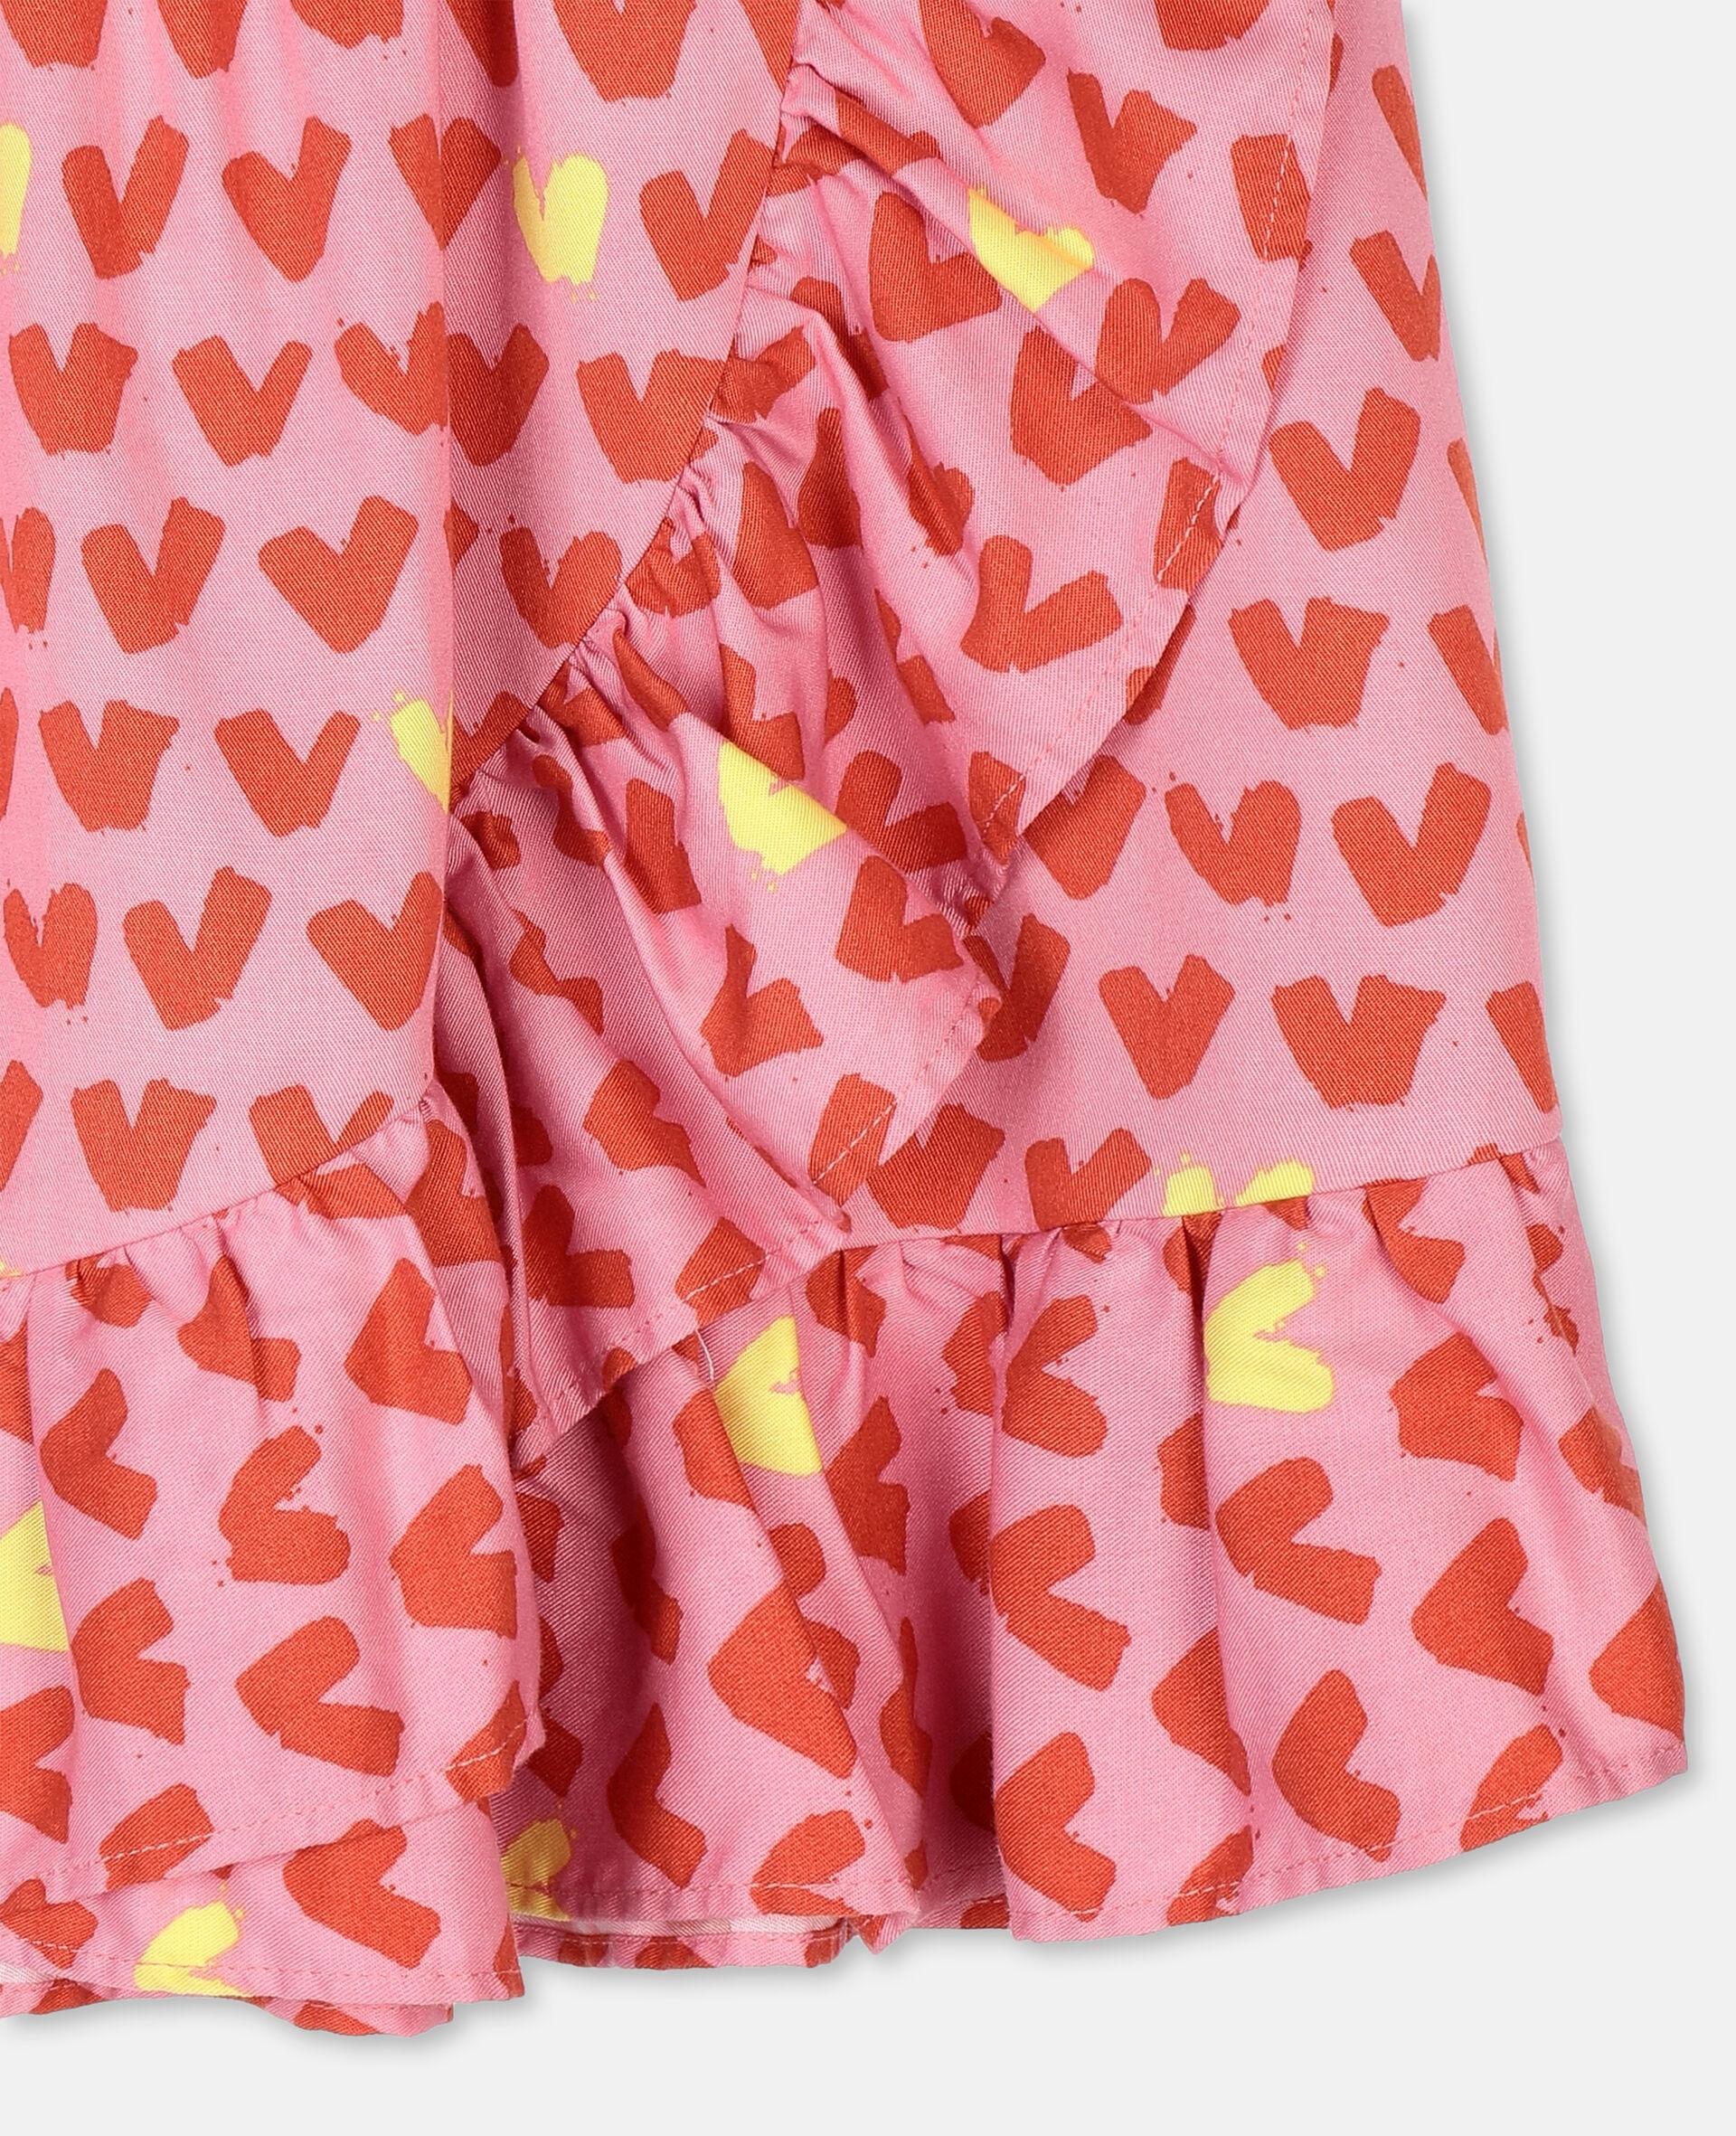 Hearts 粘胶纤维斜纹布半身裙 -粉色-large image number 1